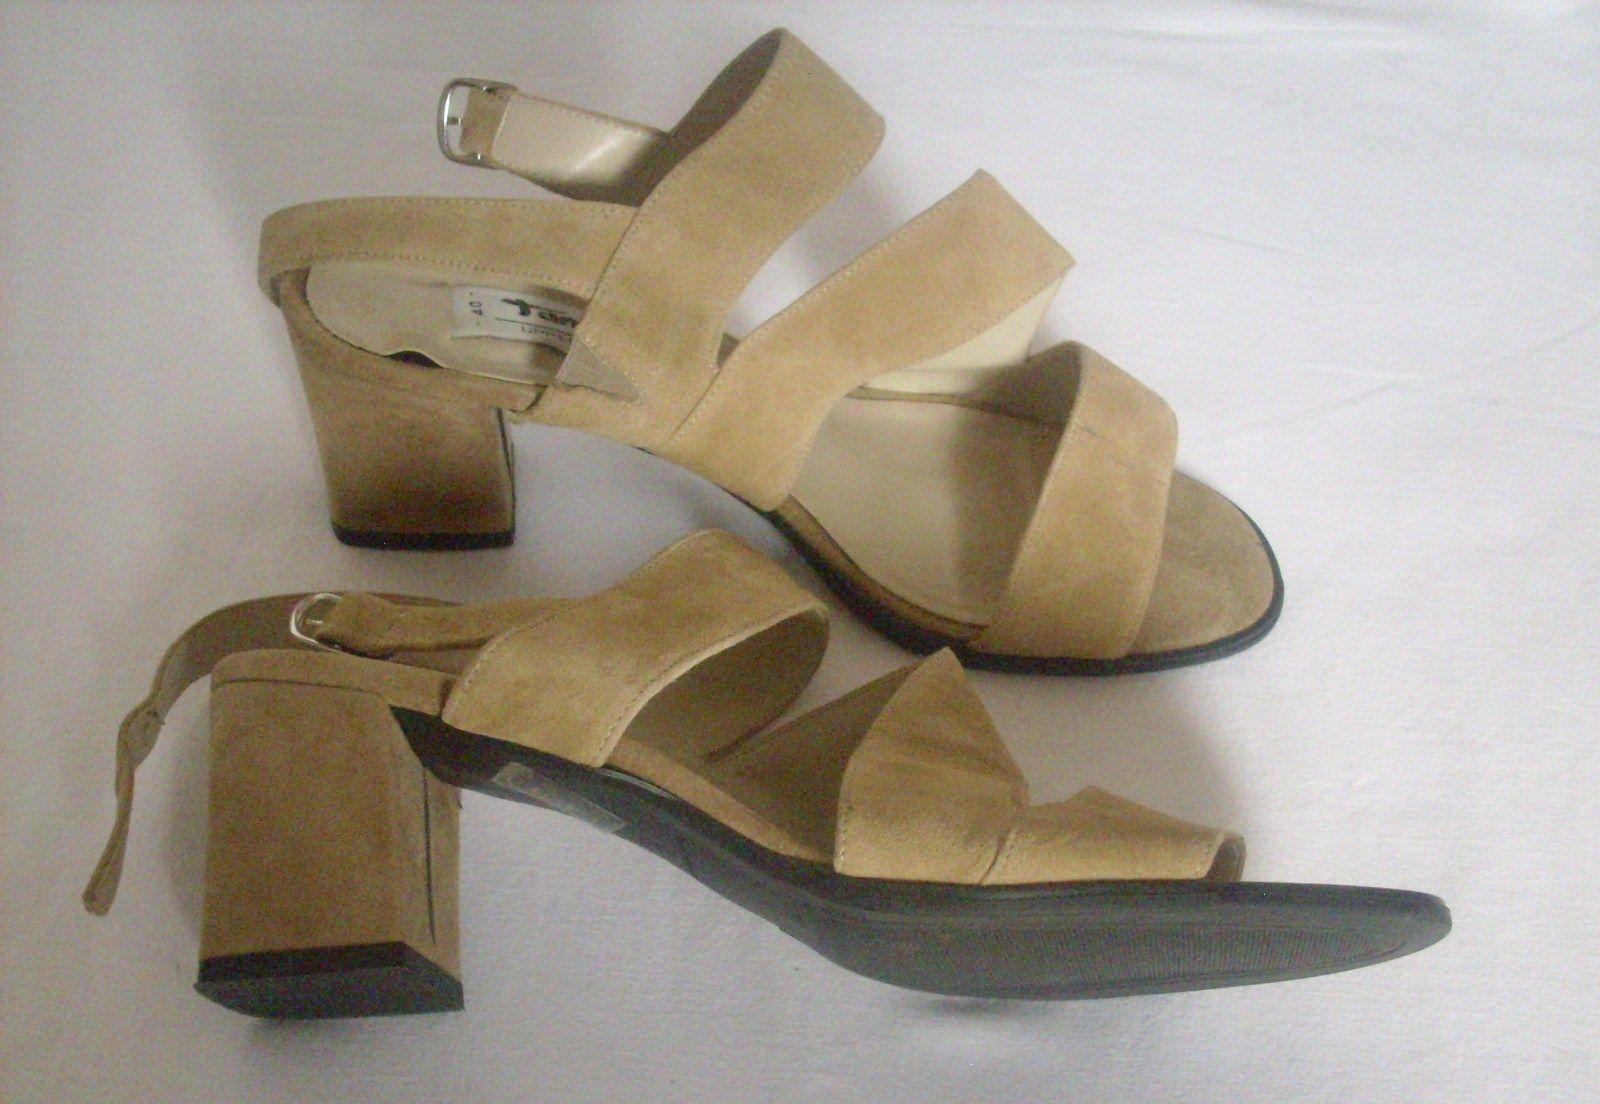 Krásné kožené pohodlné sandálky   www.secondhand1.cz